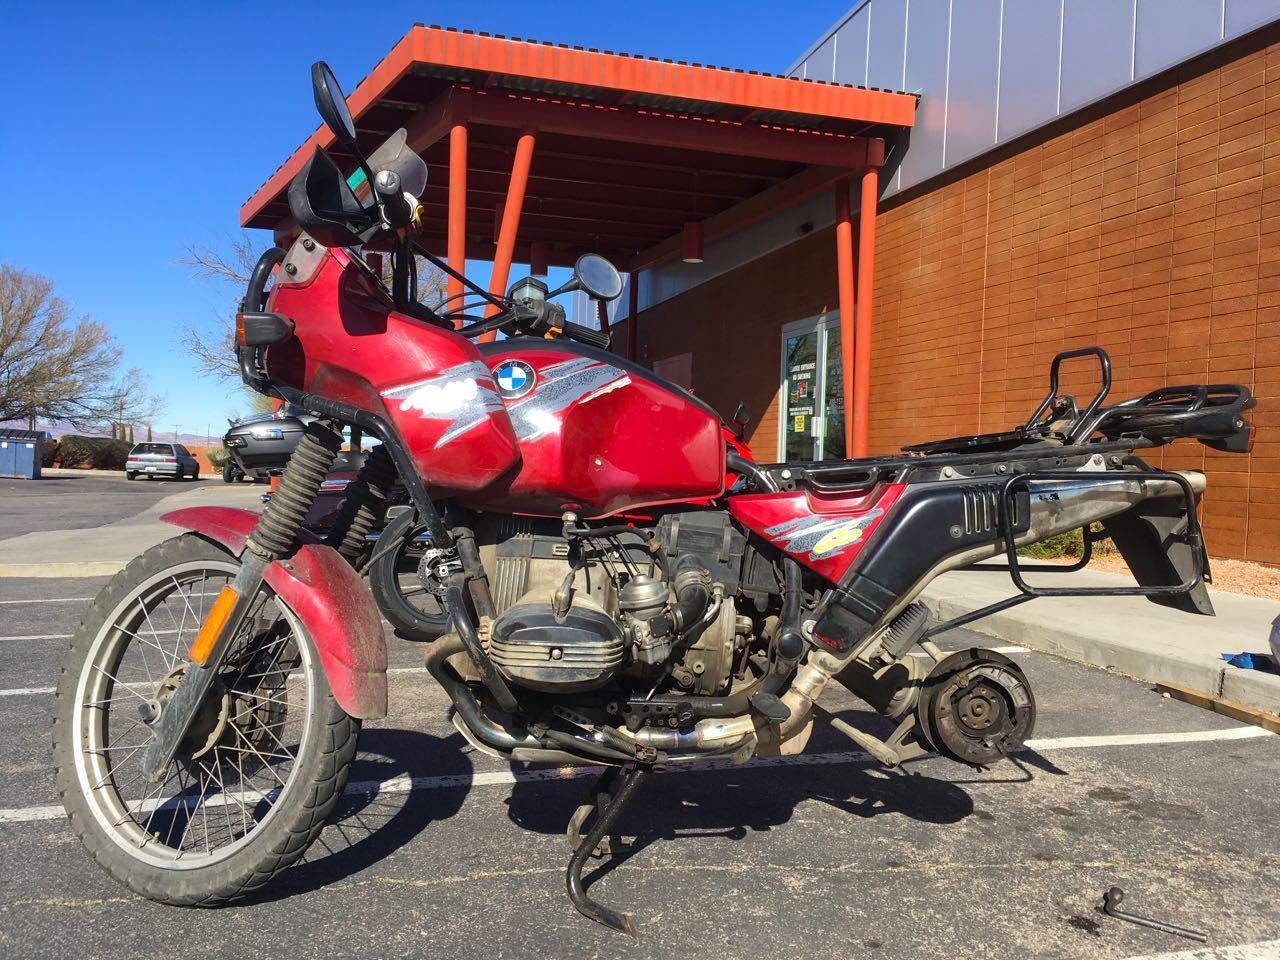 At Mother Road Harley Davidson